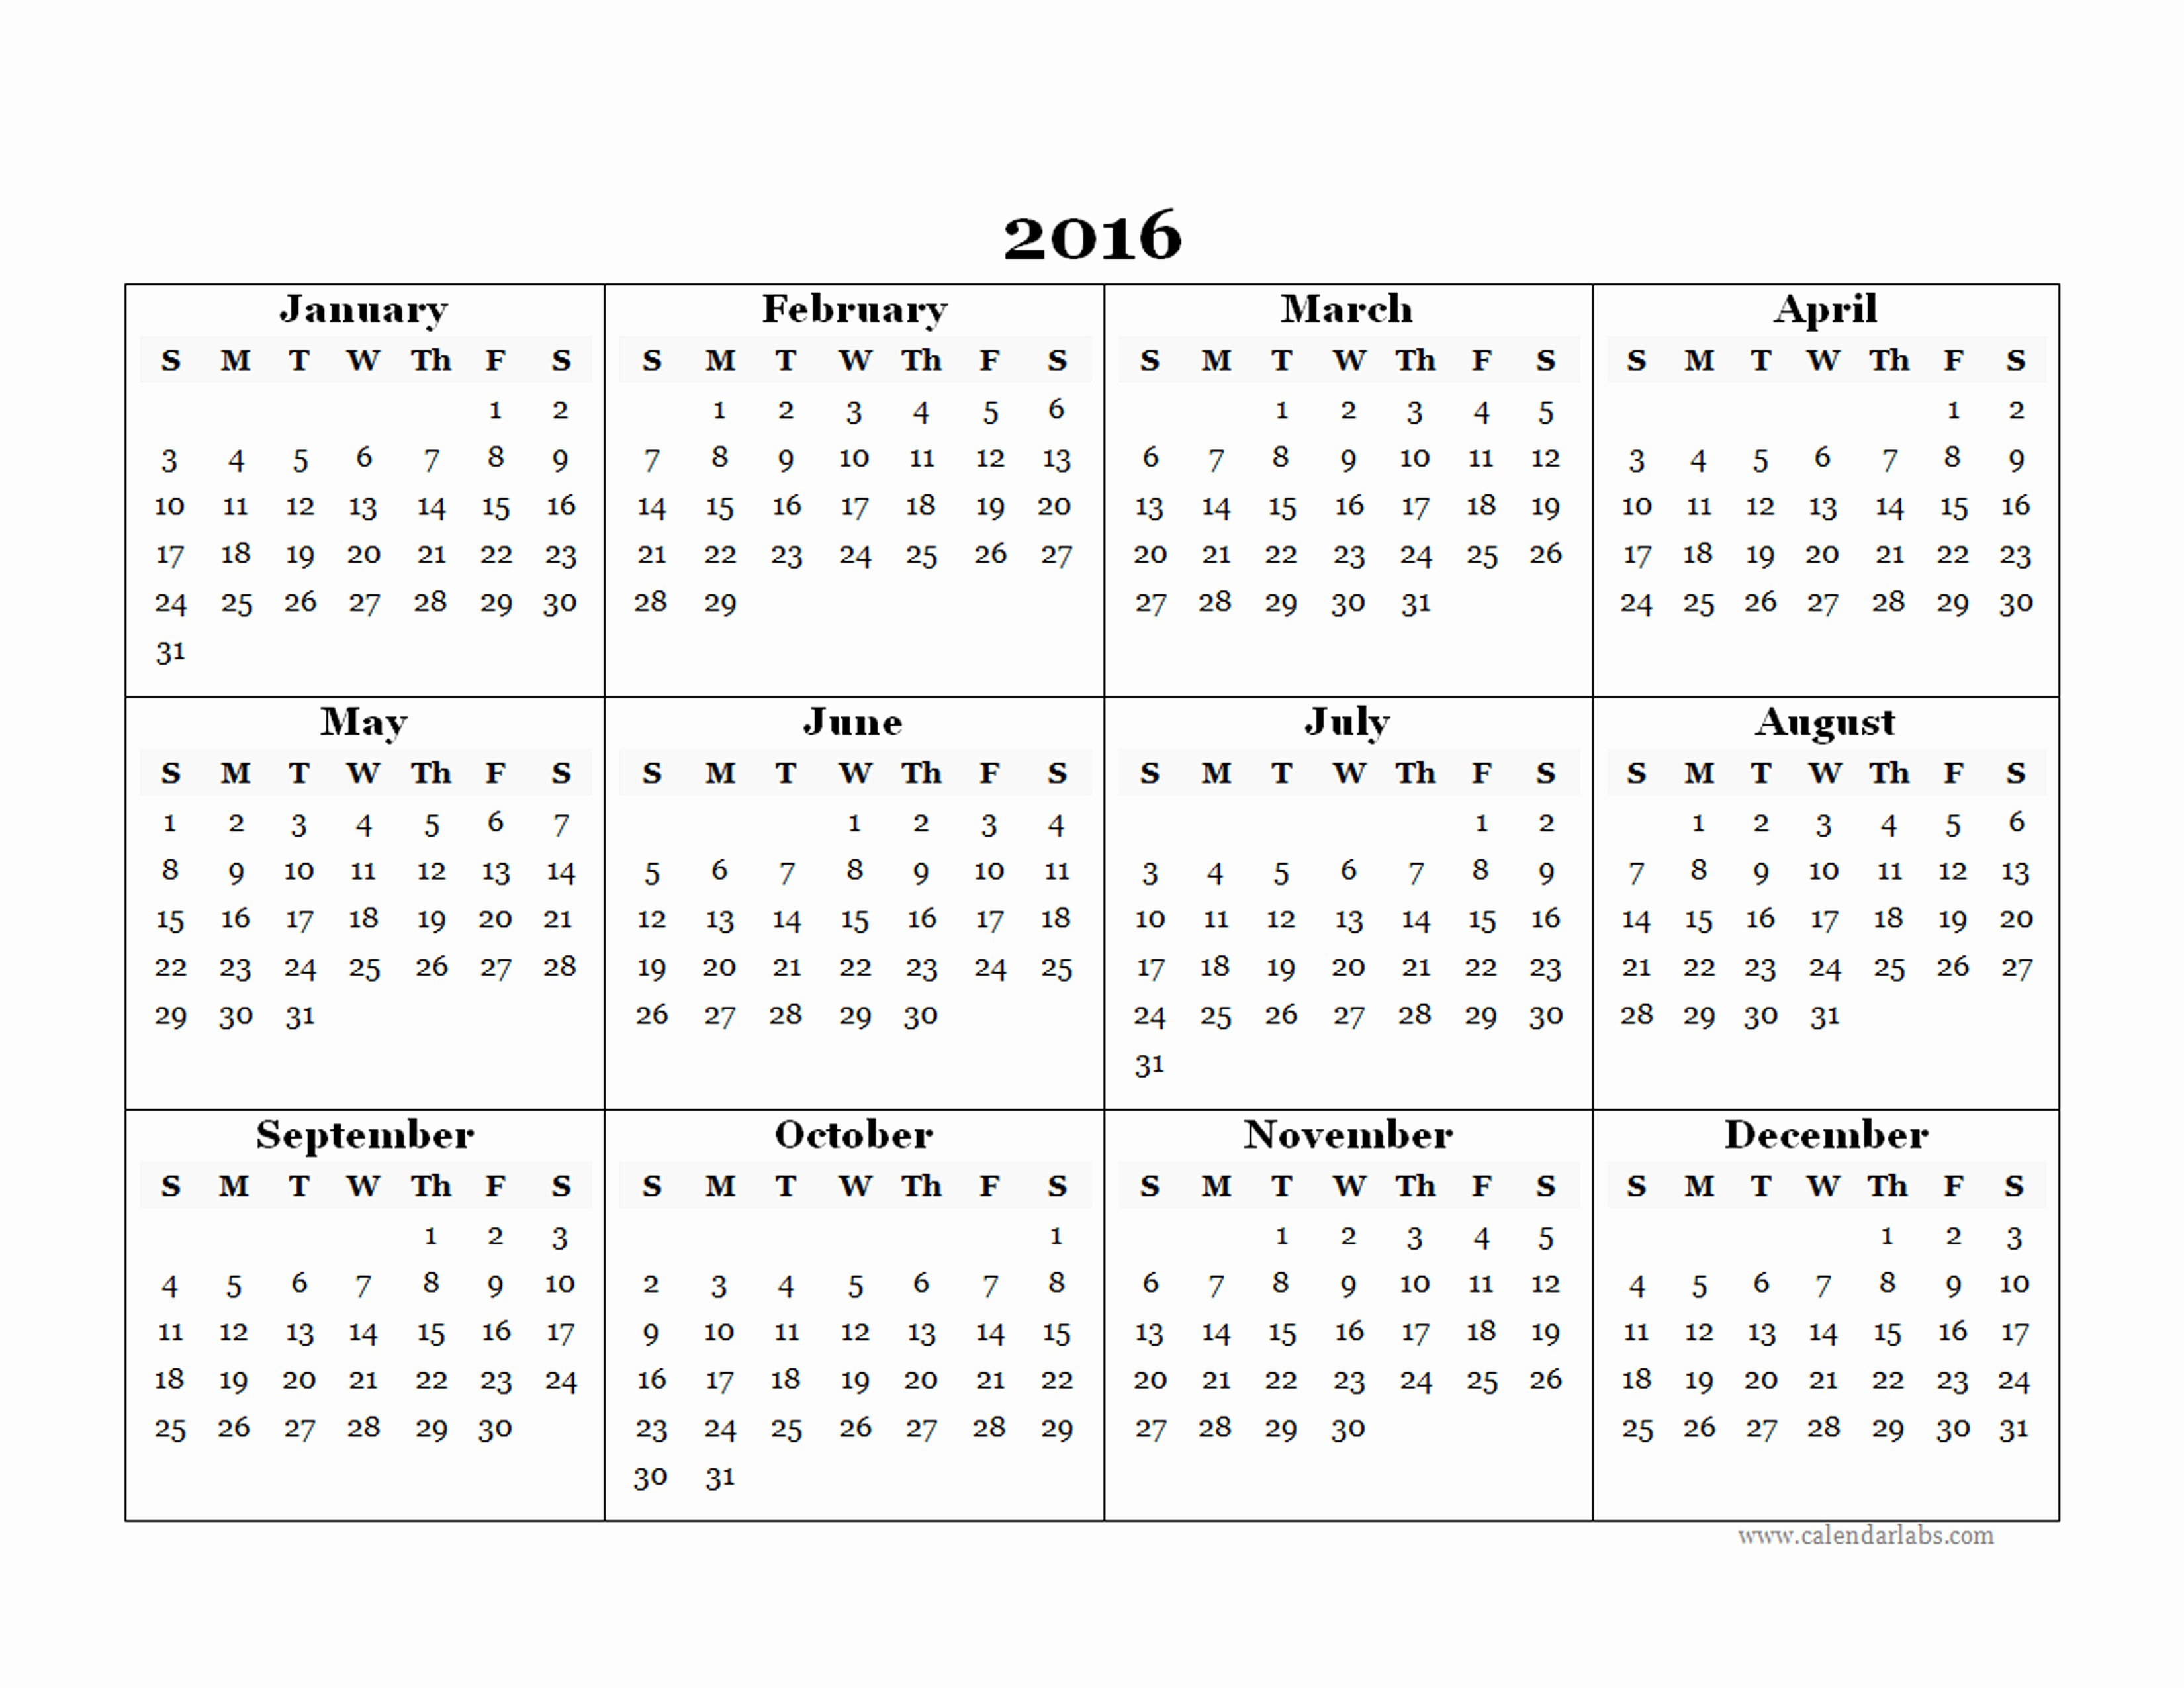 Free Printable Calendars 2016 Templates Best Of 2016 Yearly Calendar Template 07 Free Printable Templates